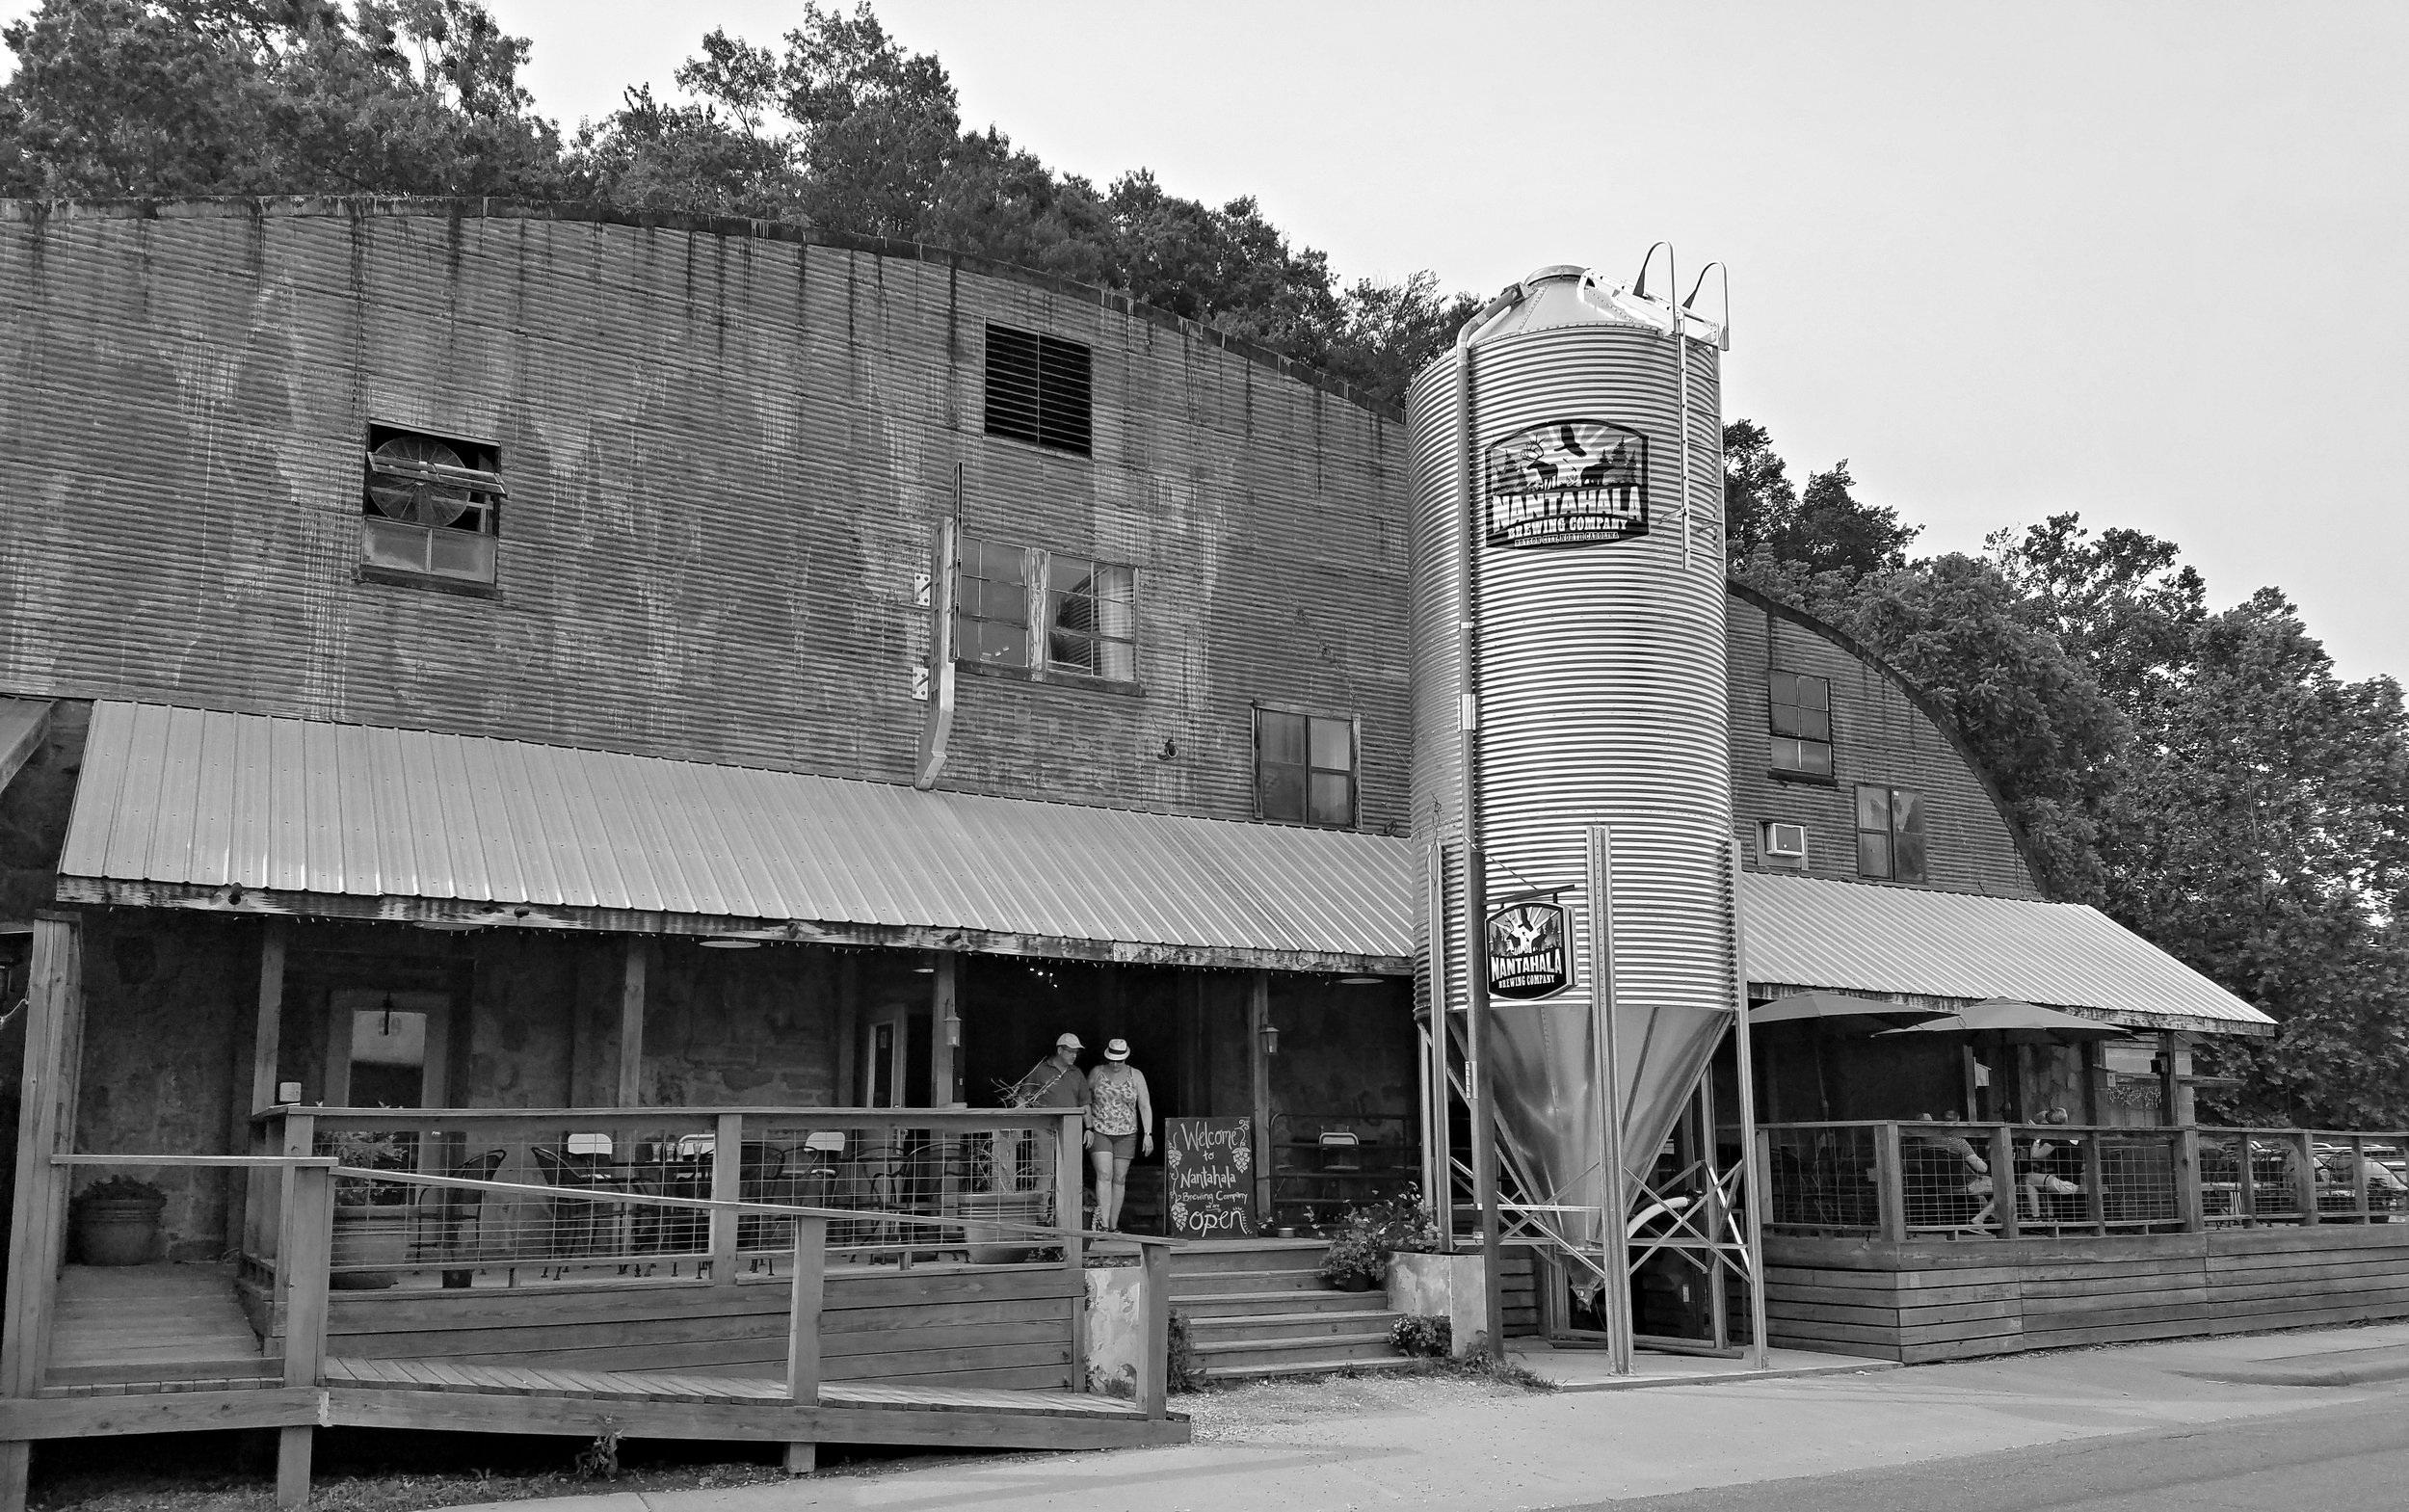 nantahala-brewing-company-bryson-city-tap-room.jpg